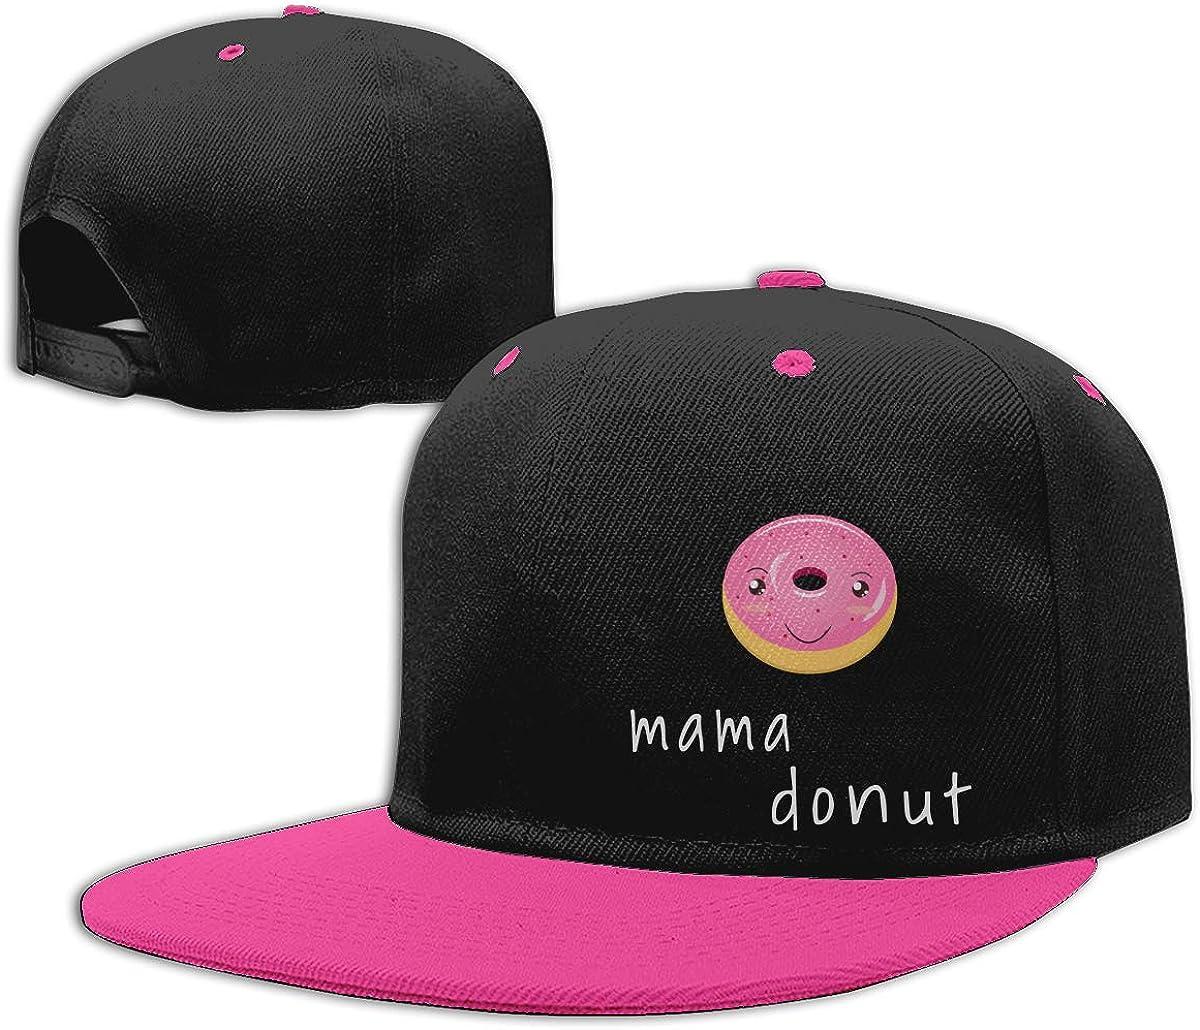 NMG-01 Men Womens Dad Hat Mama Donuts Unisex Flat Peaked Baseball Caps